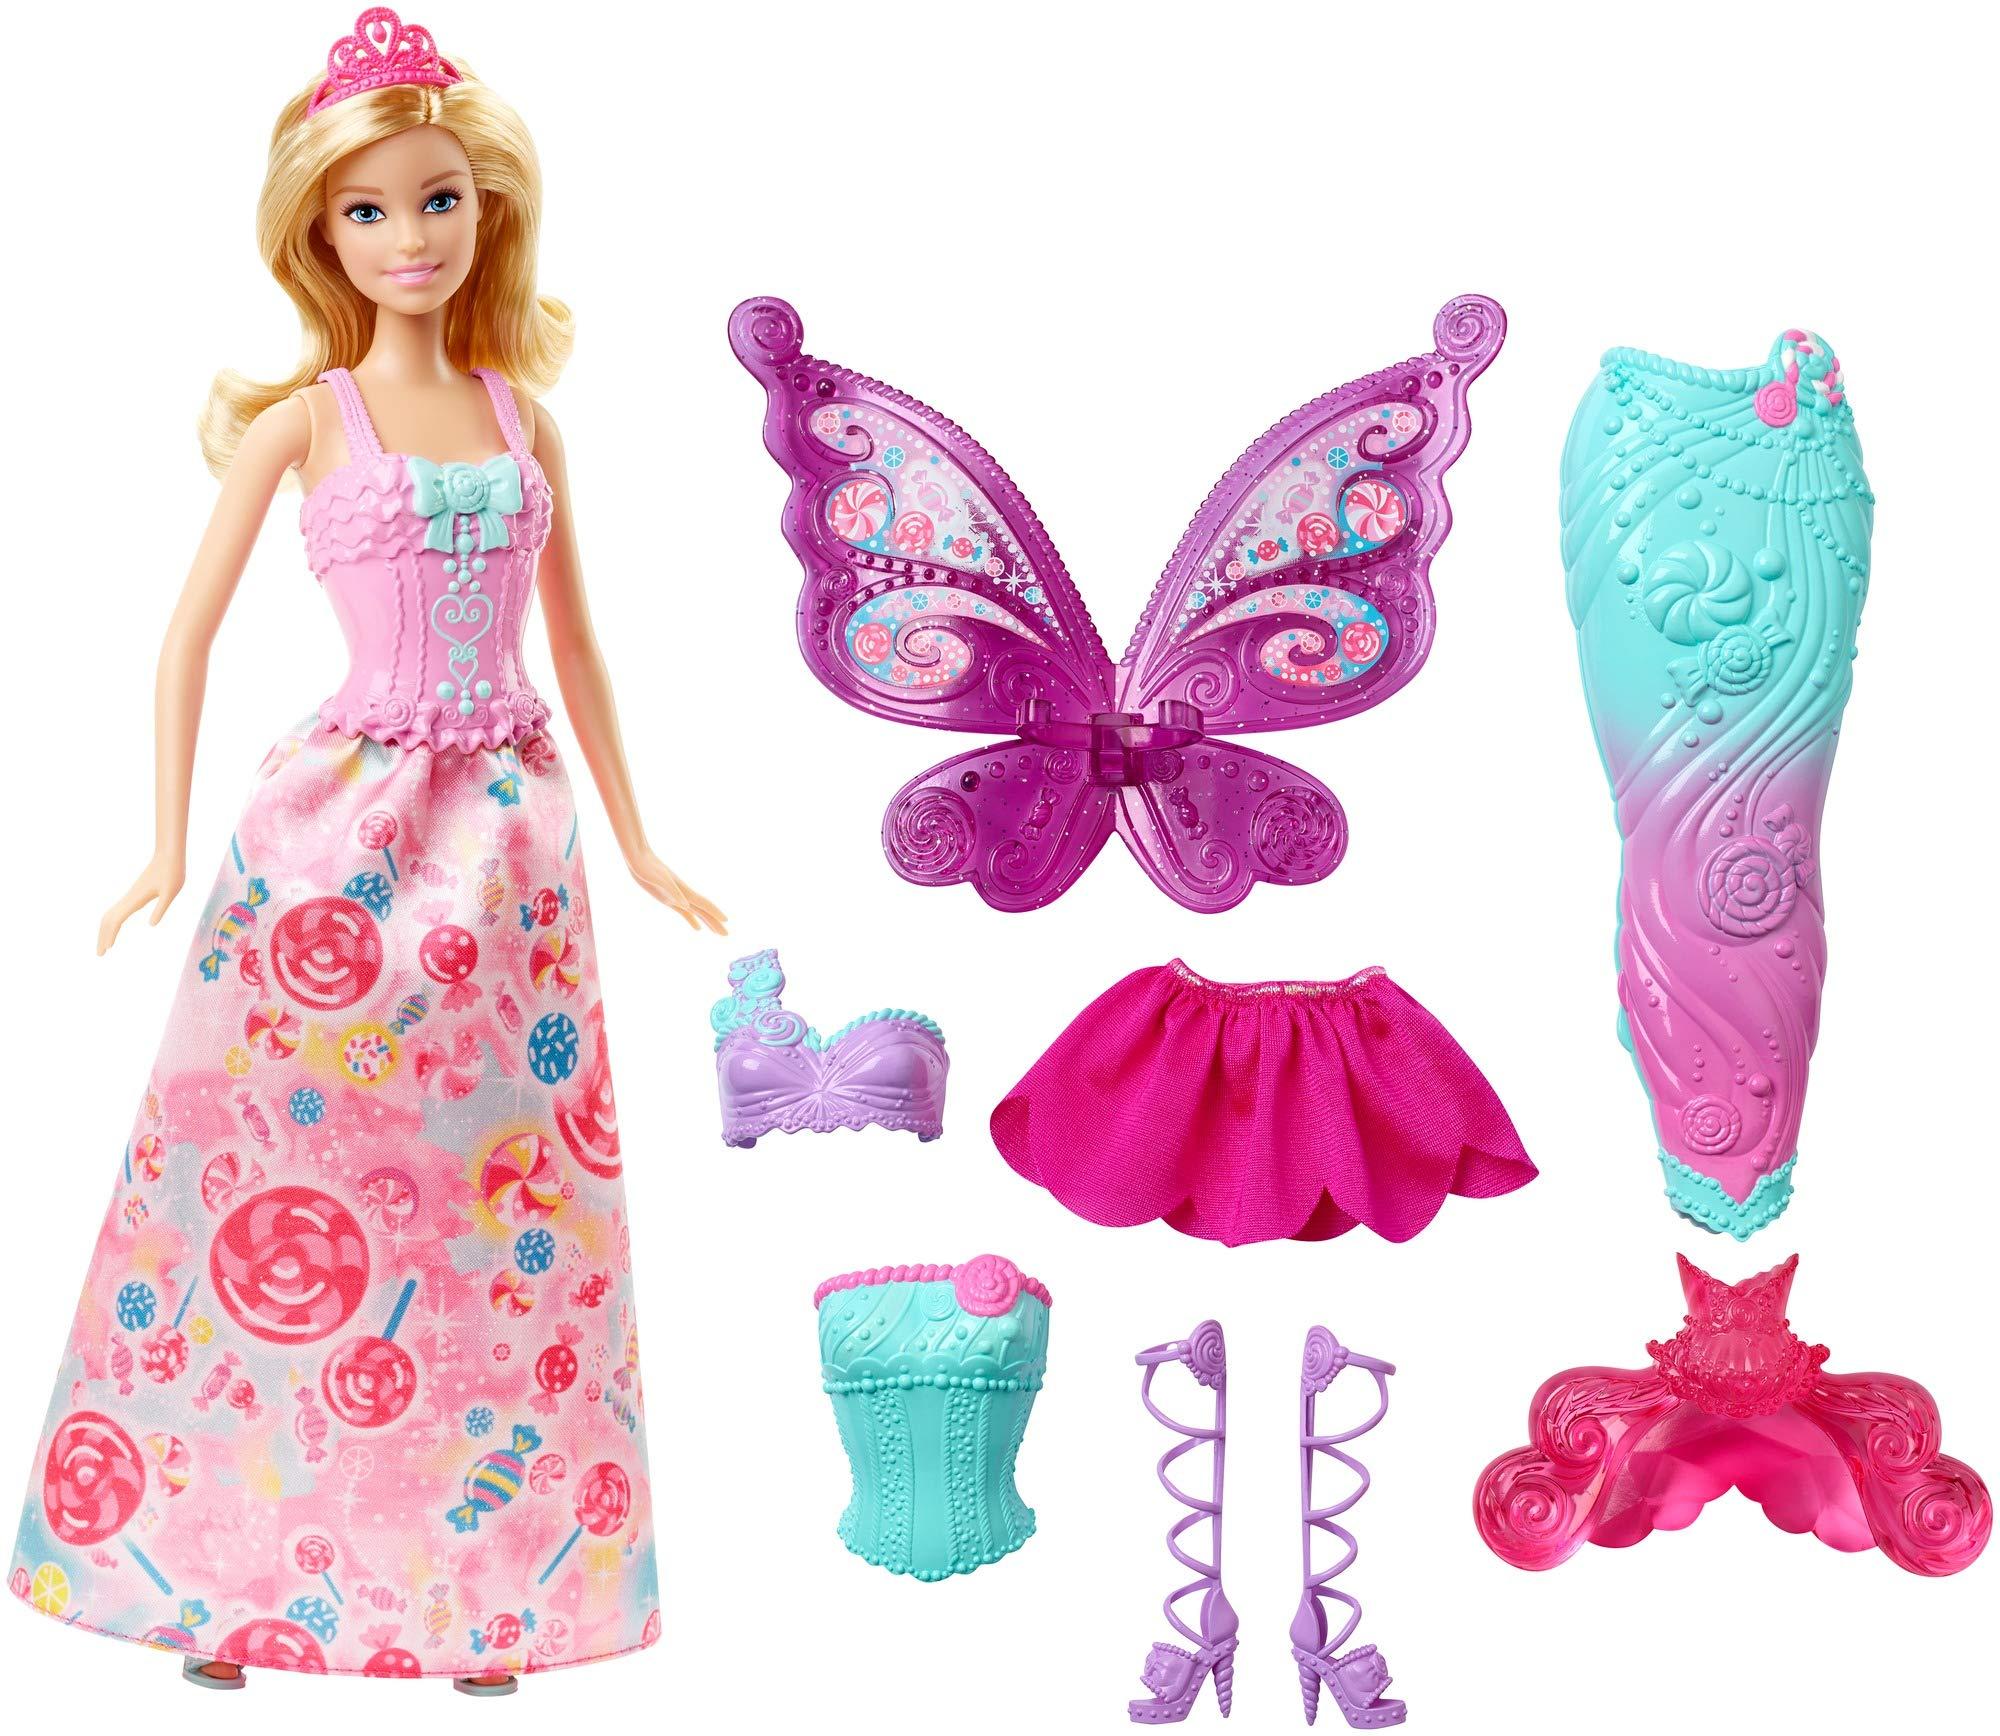 Barbie Fairytale Dress Up Doll [Amazon Exclusive]